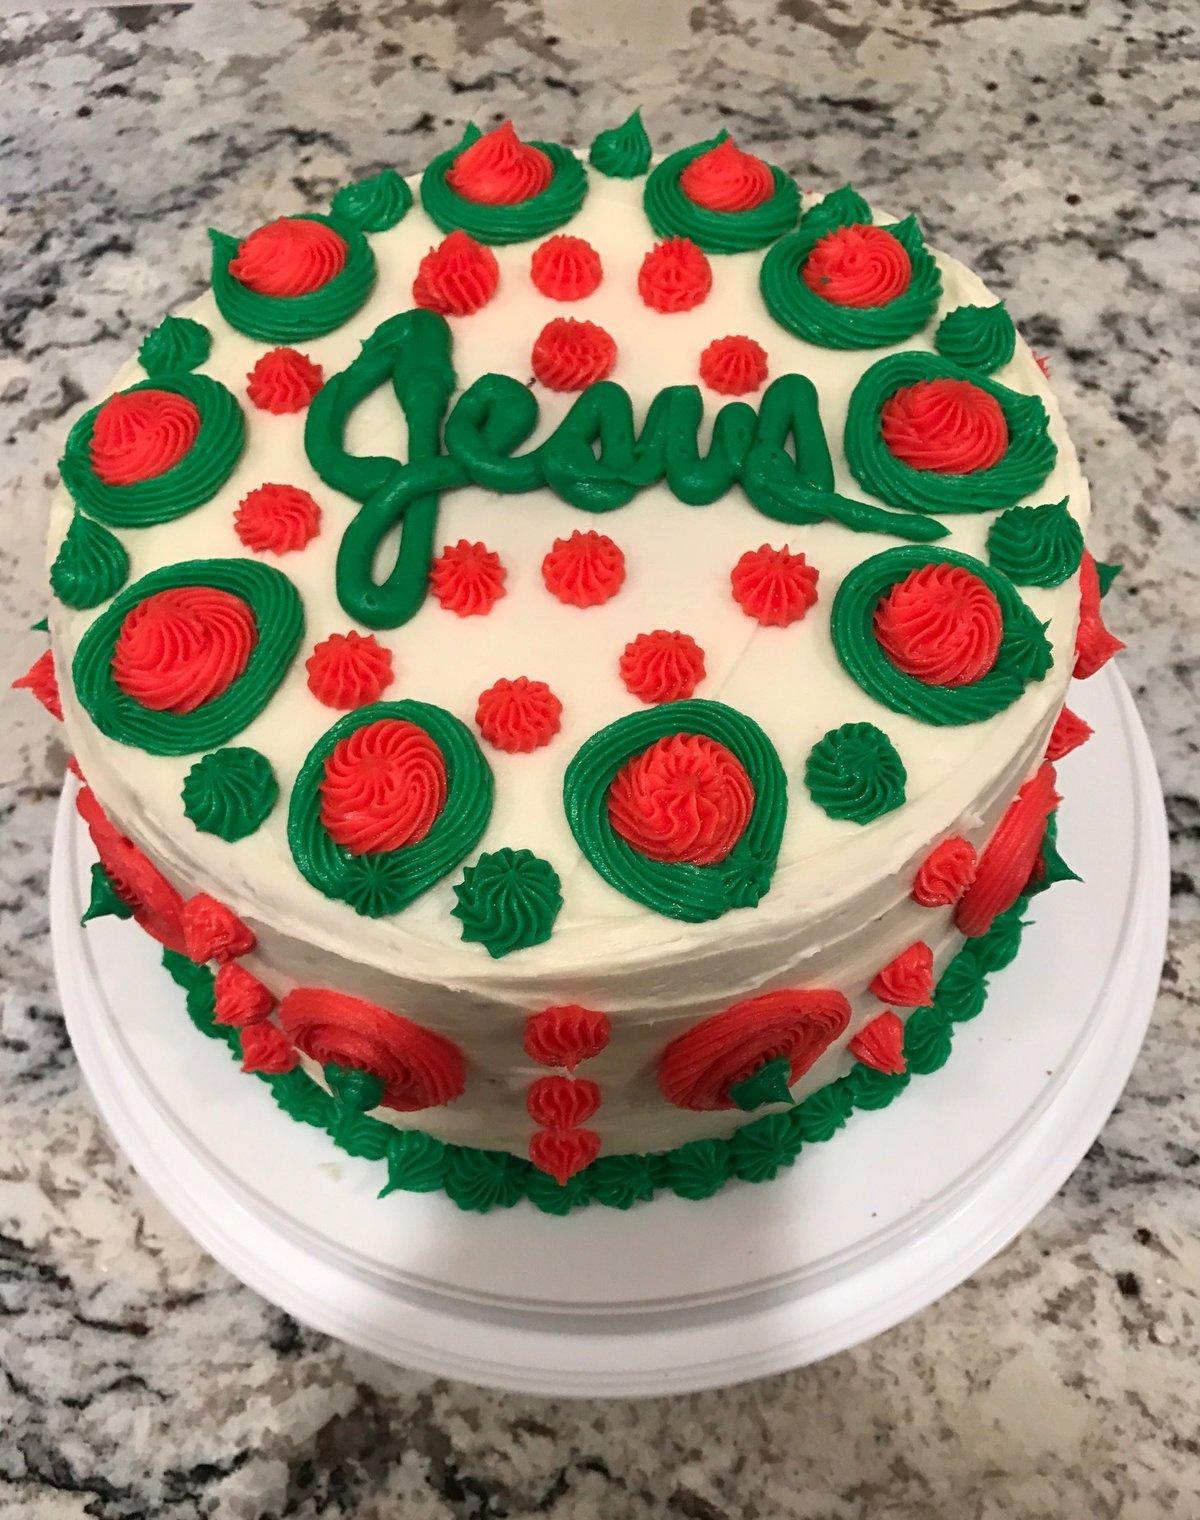 decorated birthday cake for jesus